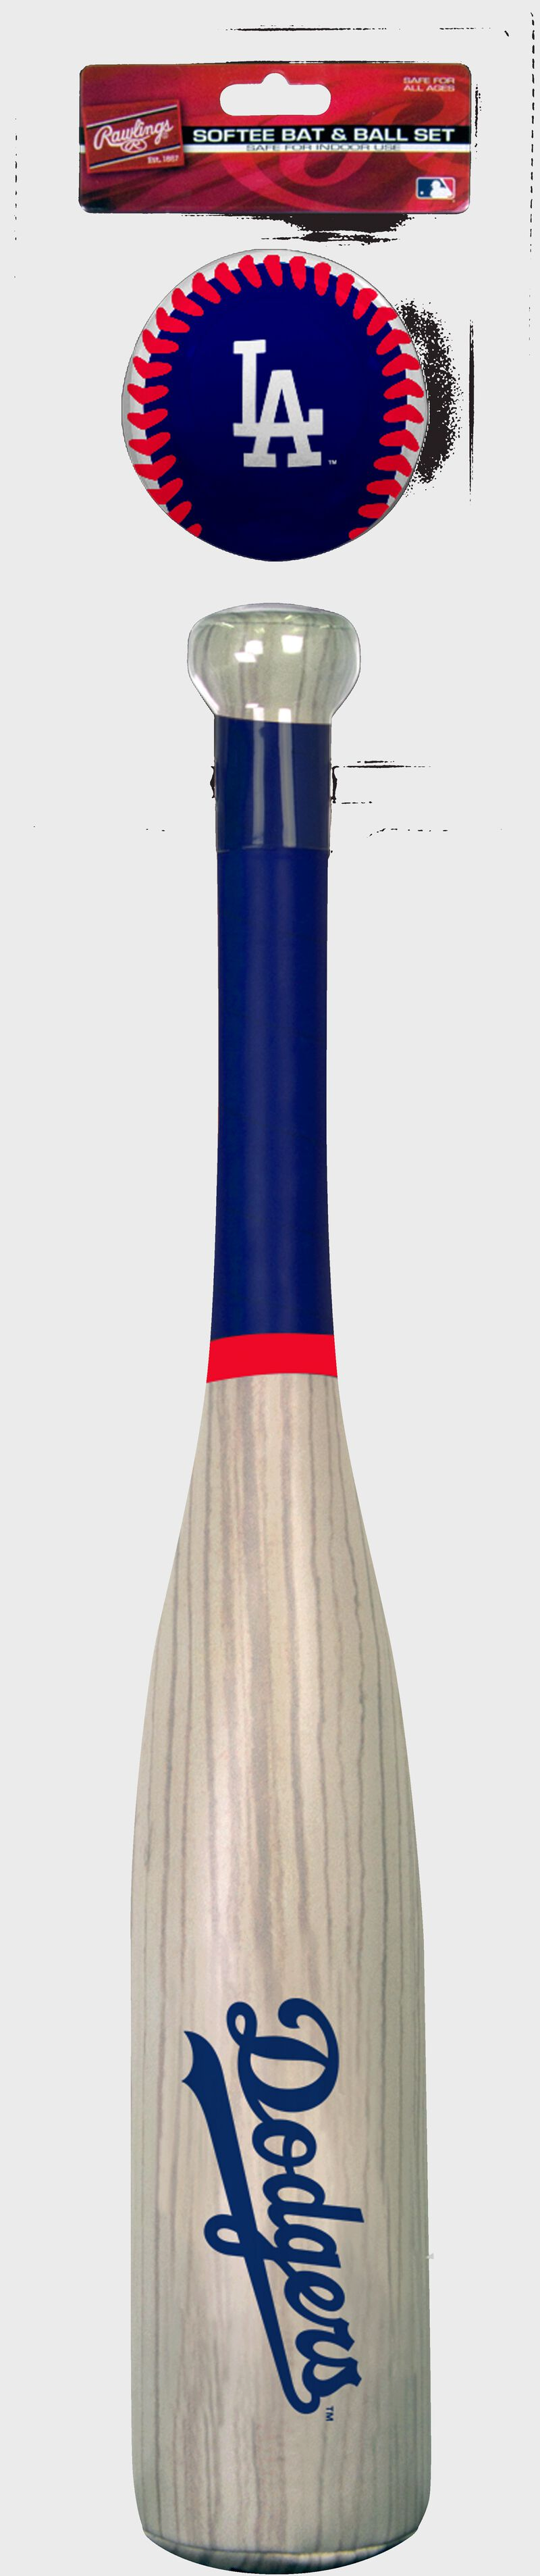 MLB Los Angeles Dodgers Bat and Ball Set